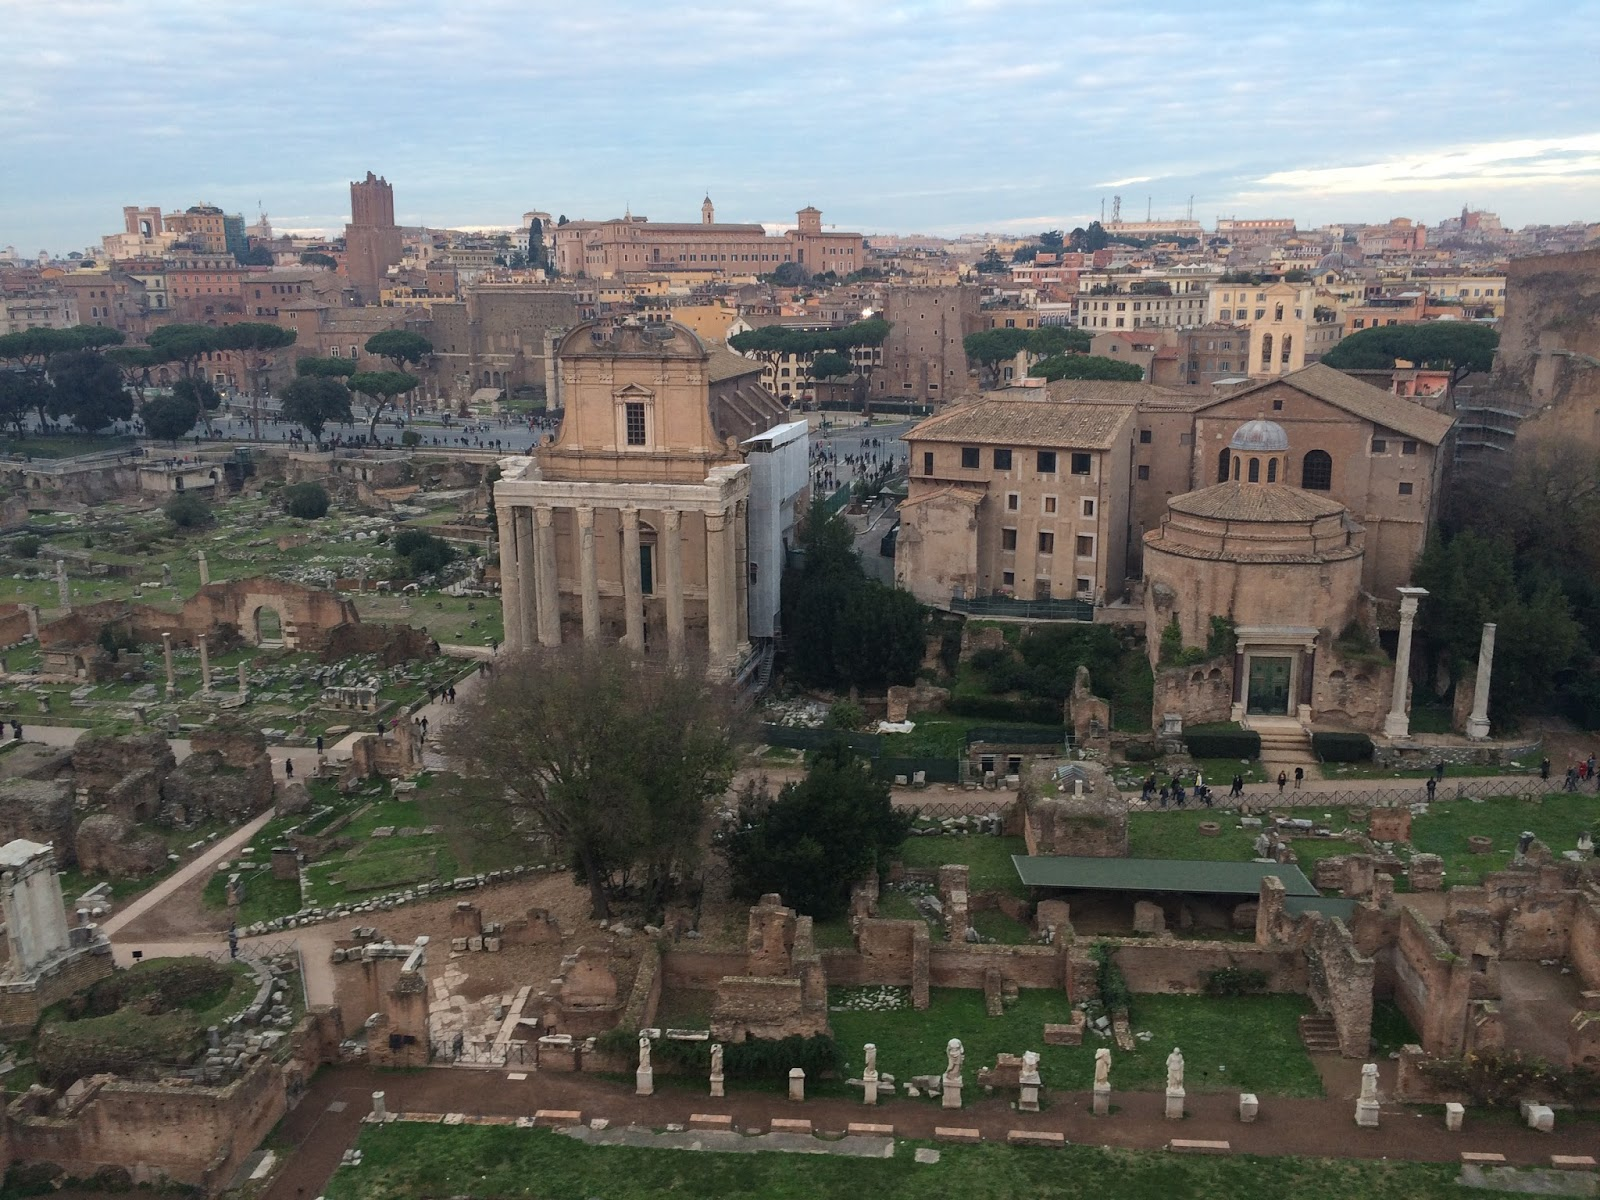 Forum in Rome, Italy